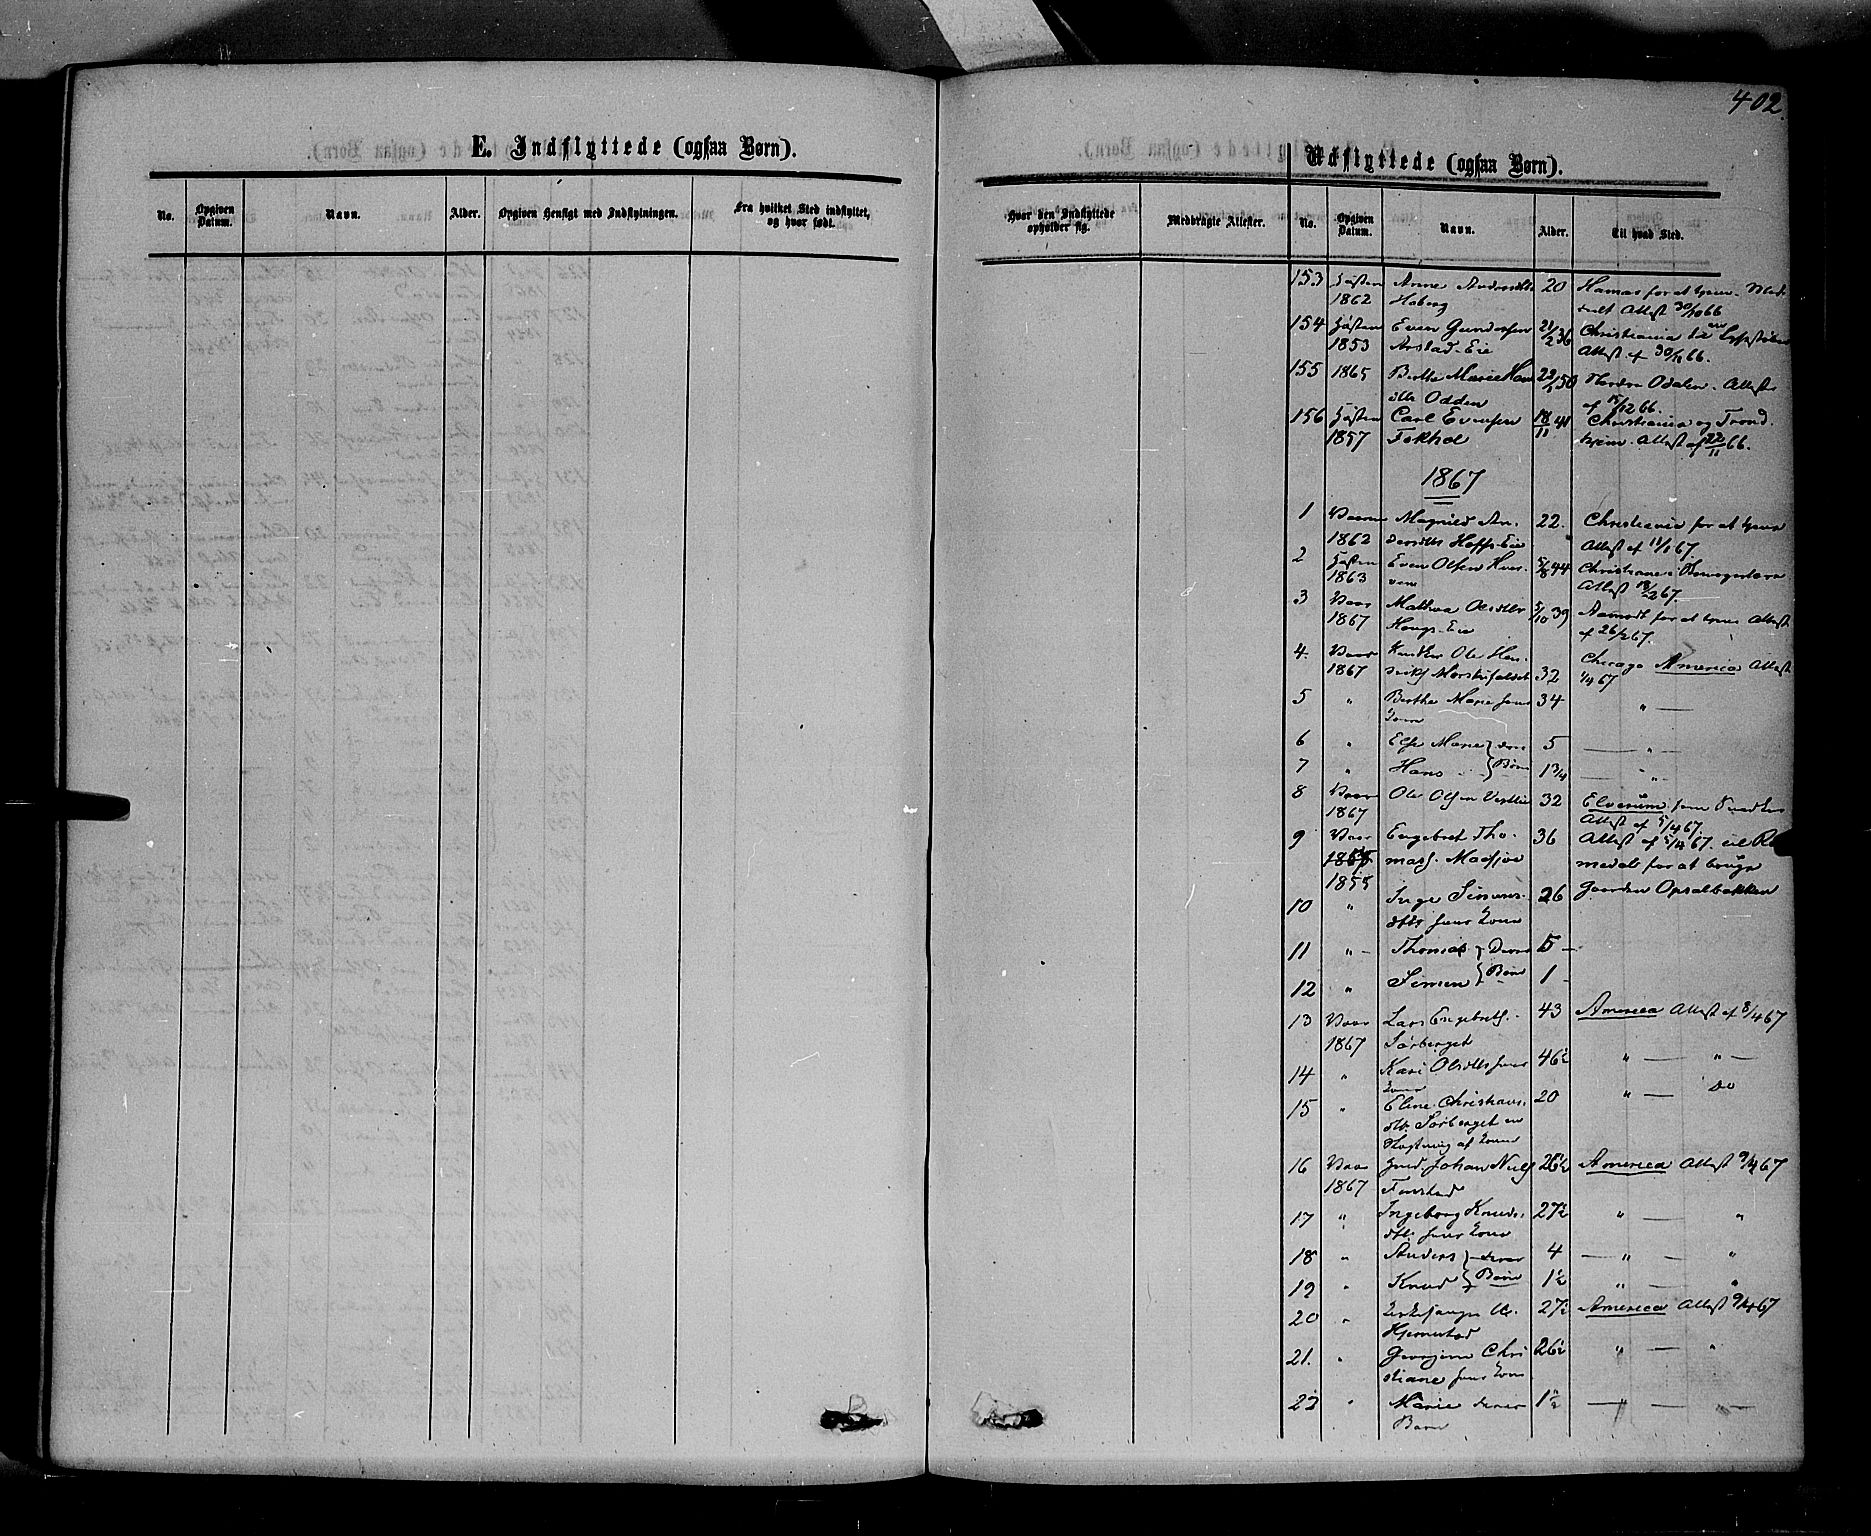 SAH, Stange prestekontor, K/L0013: Ministerialbok nr. 13, 1862-1879, s. 402